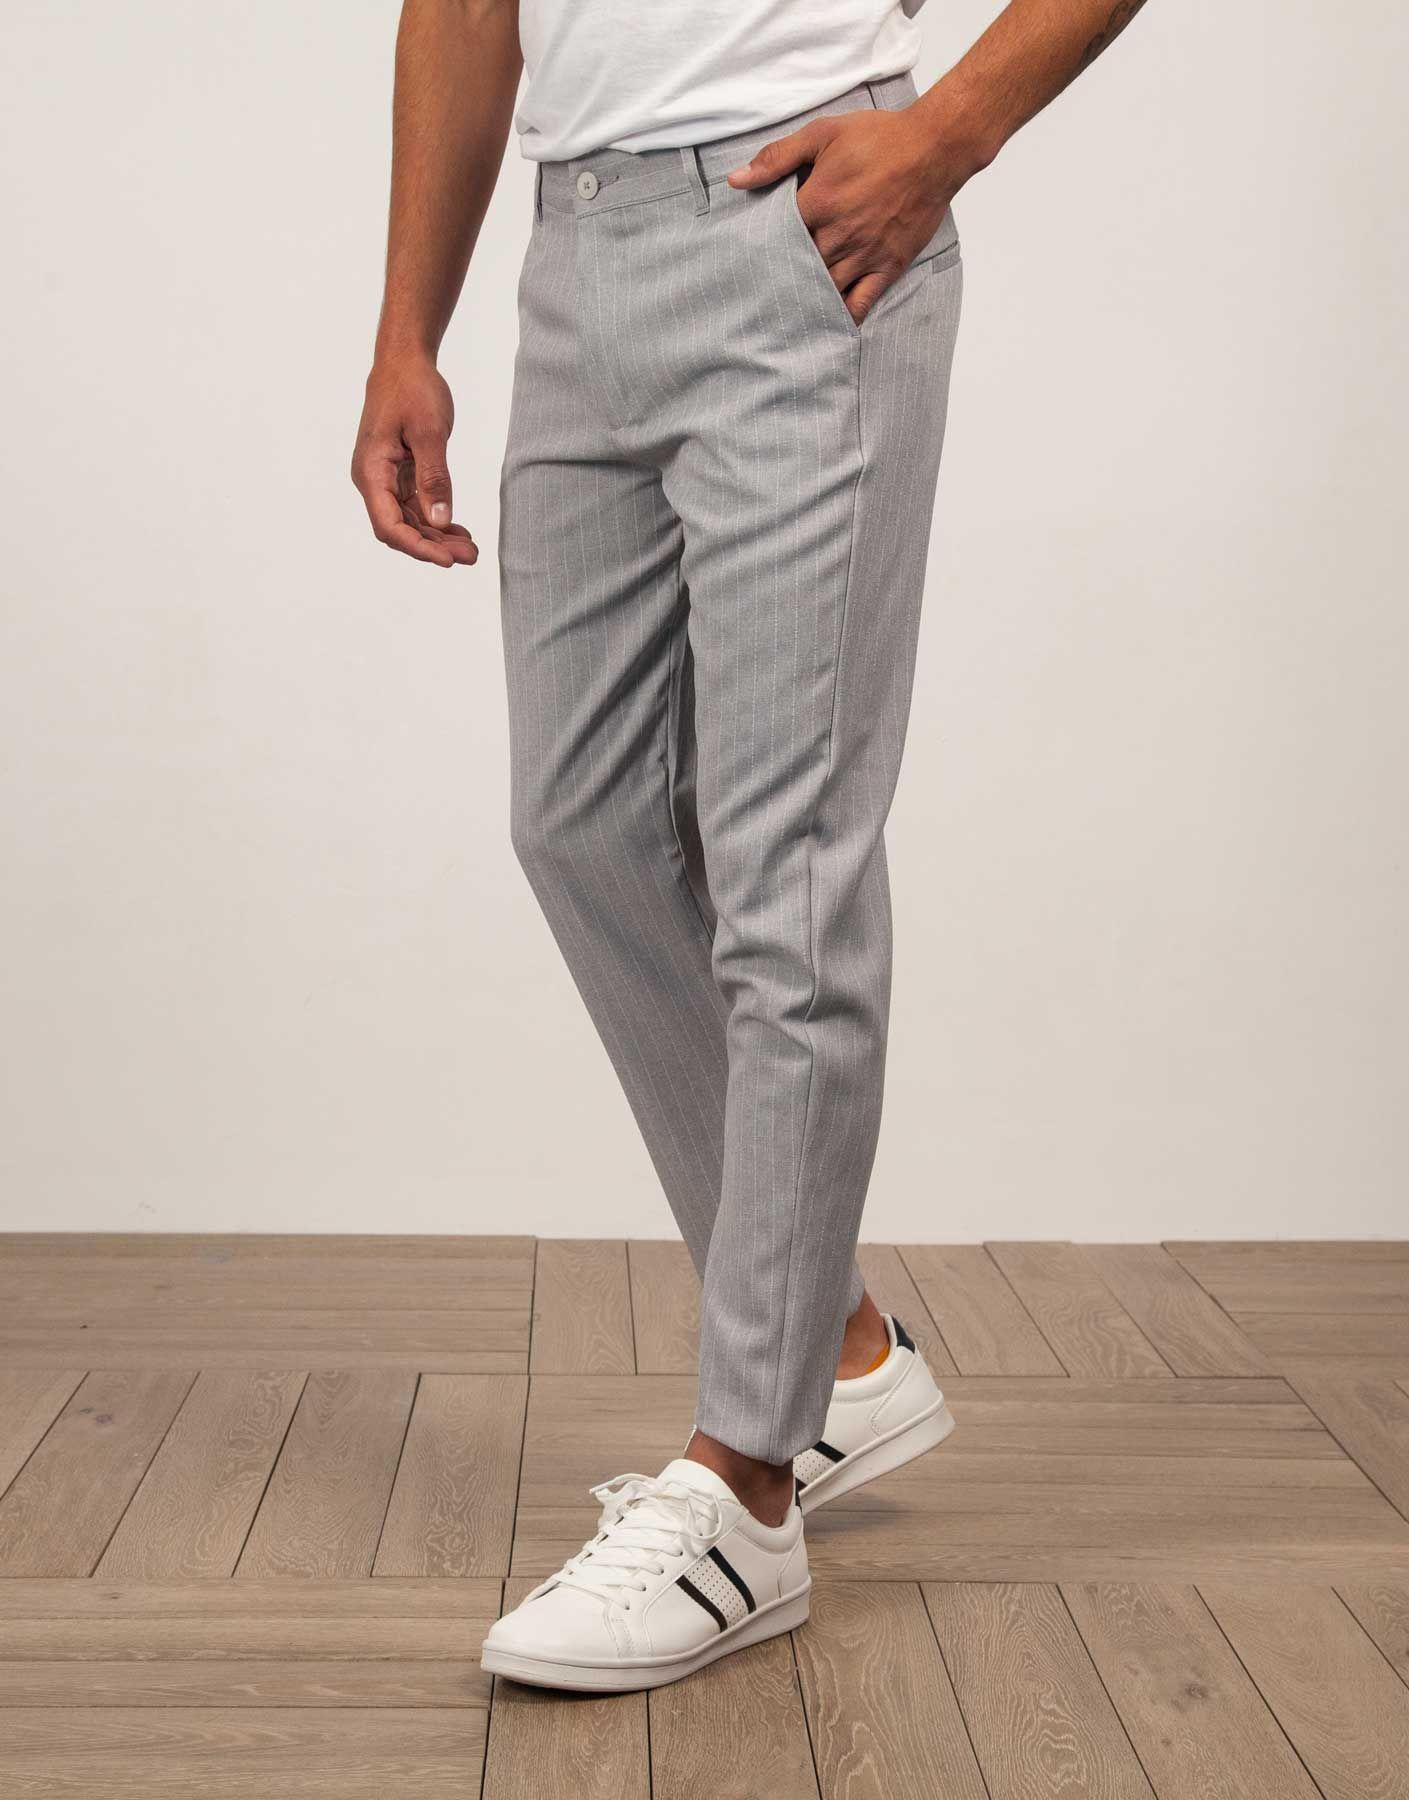 Pantalon Vestir Raya Diplomatica Gris Claro Jvz Vestido Raya Diplomatica Pantalones Moda Ropa Hombre